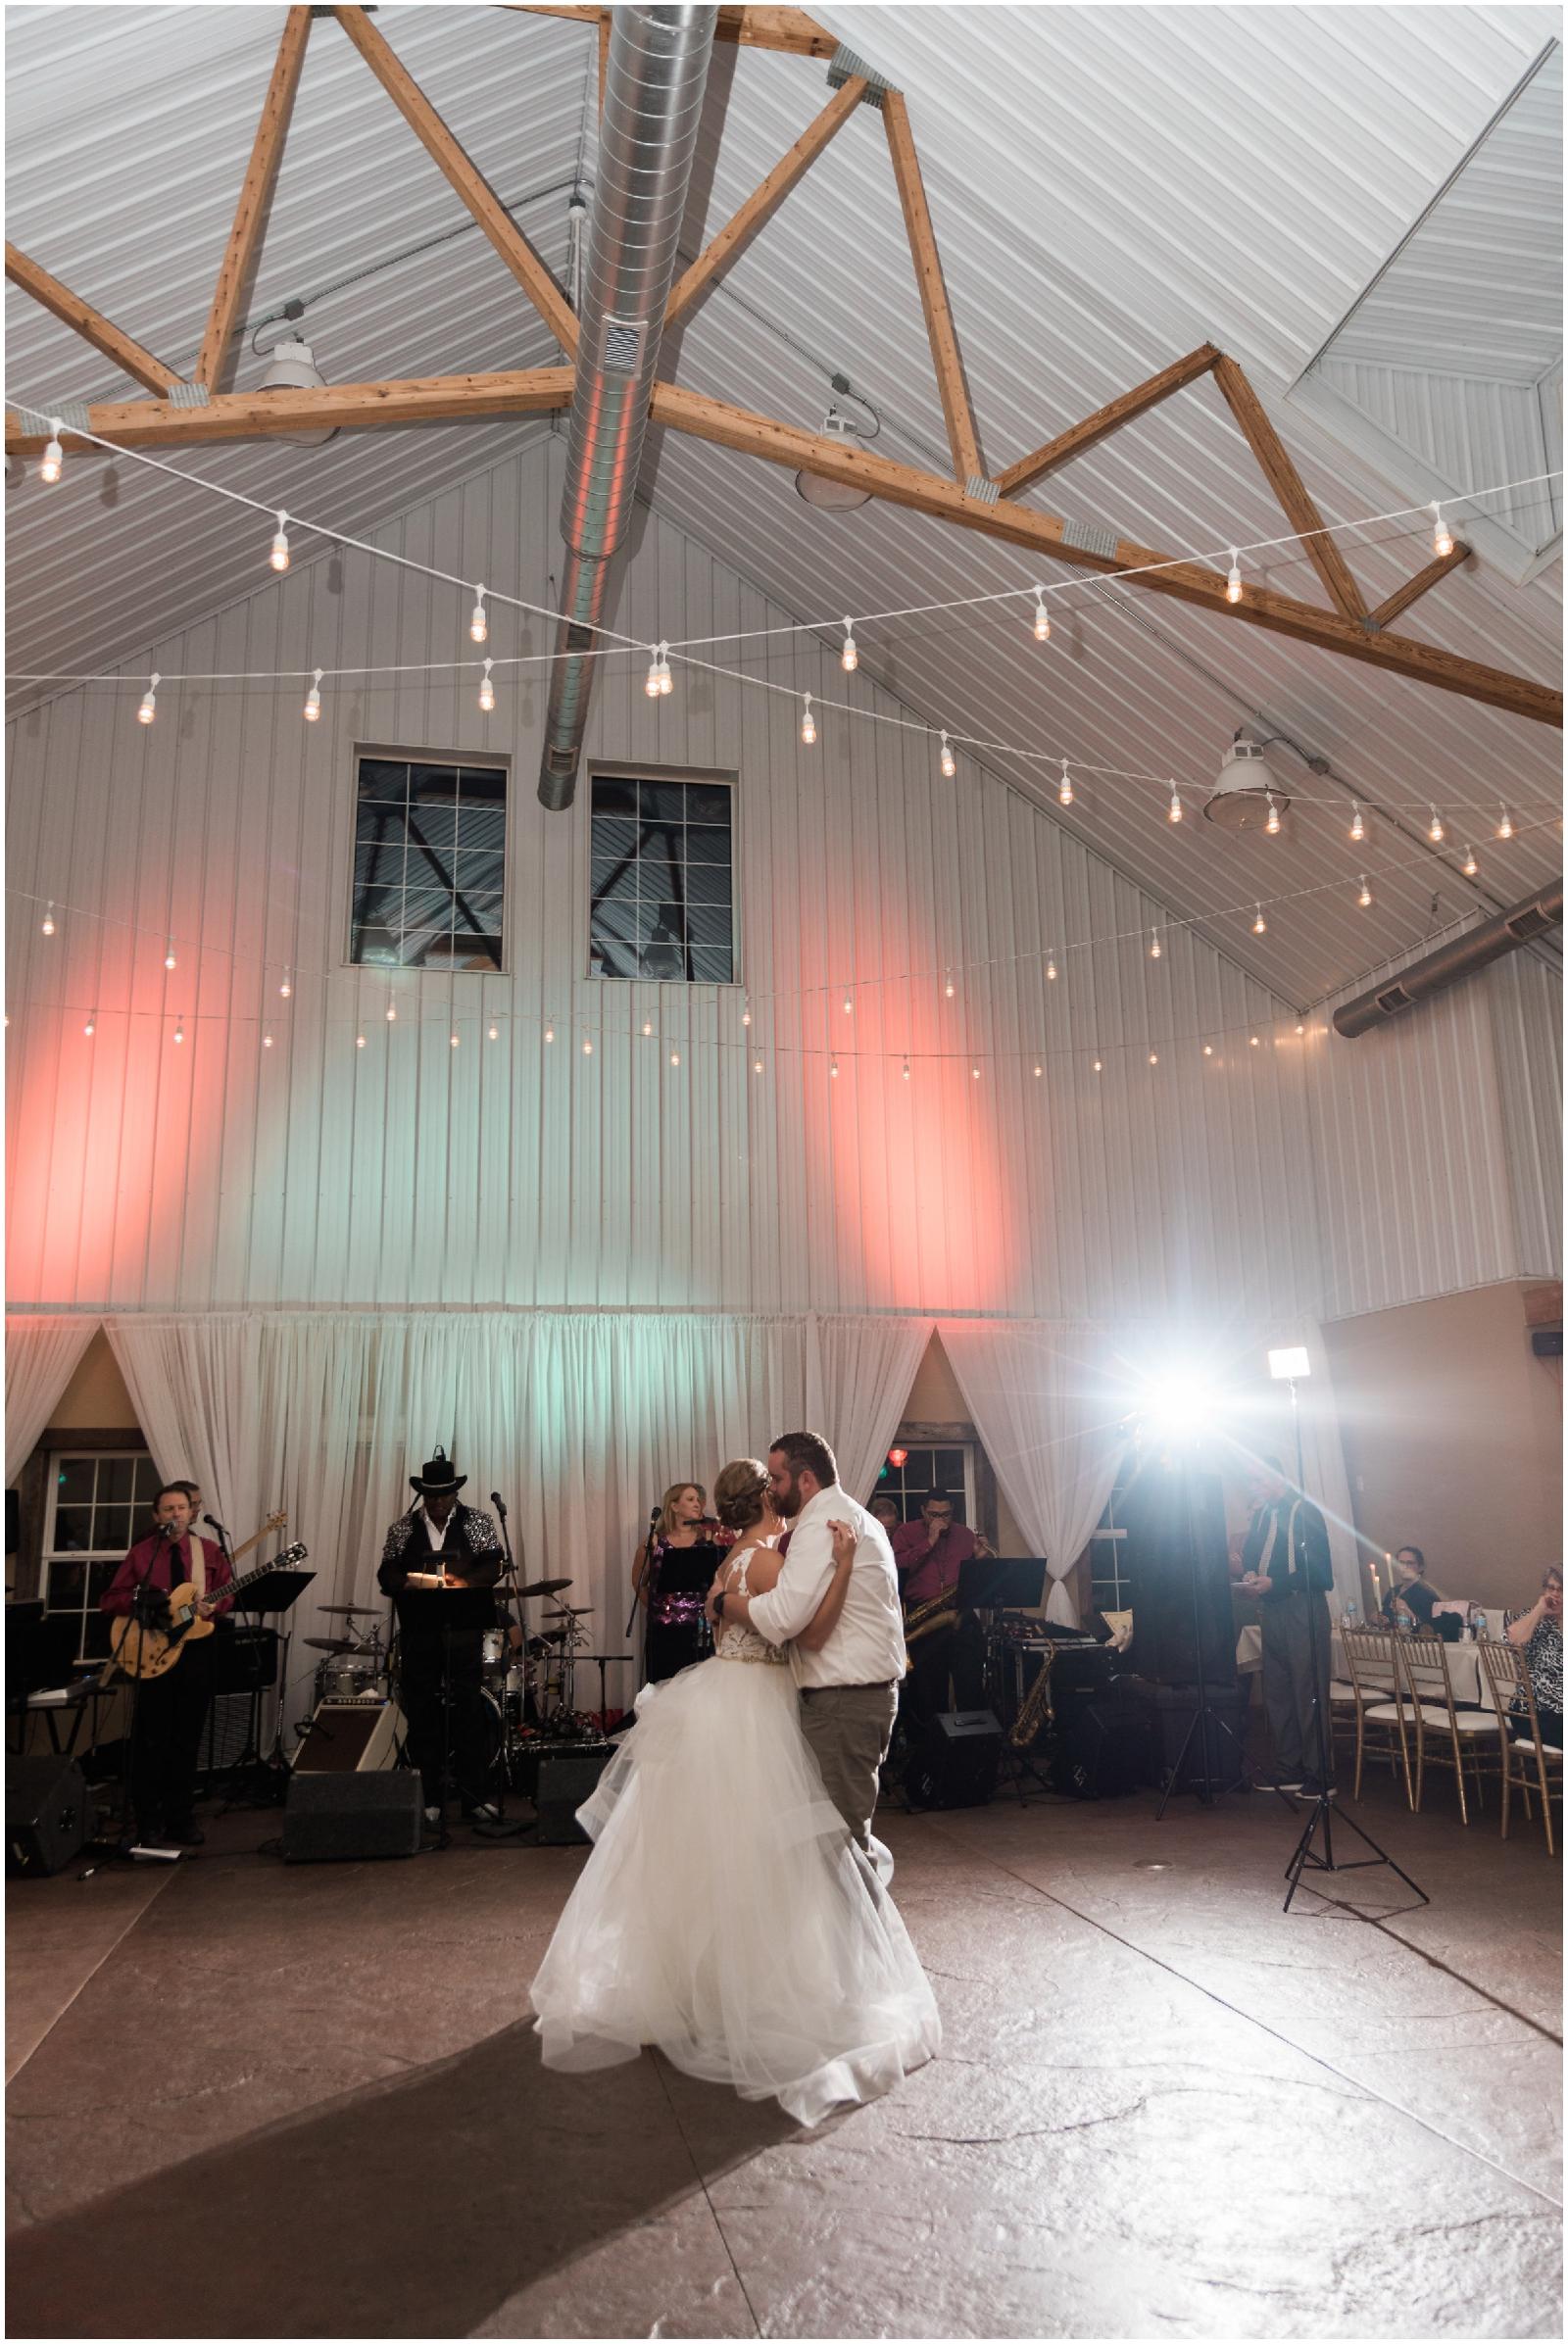 Minnesota-Wedding-Venue- Chaska-MN-Rustic-Barn-Weddings_0574.jpg